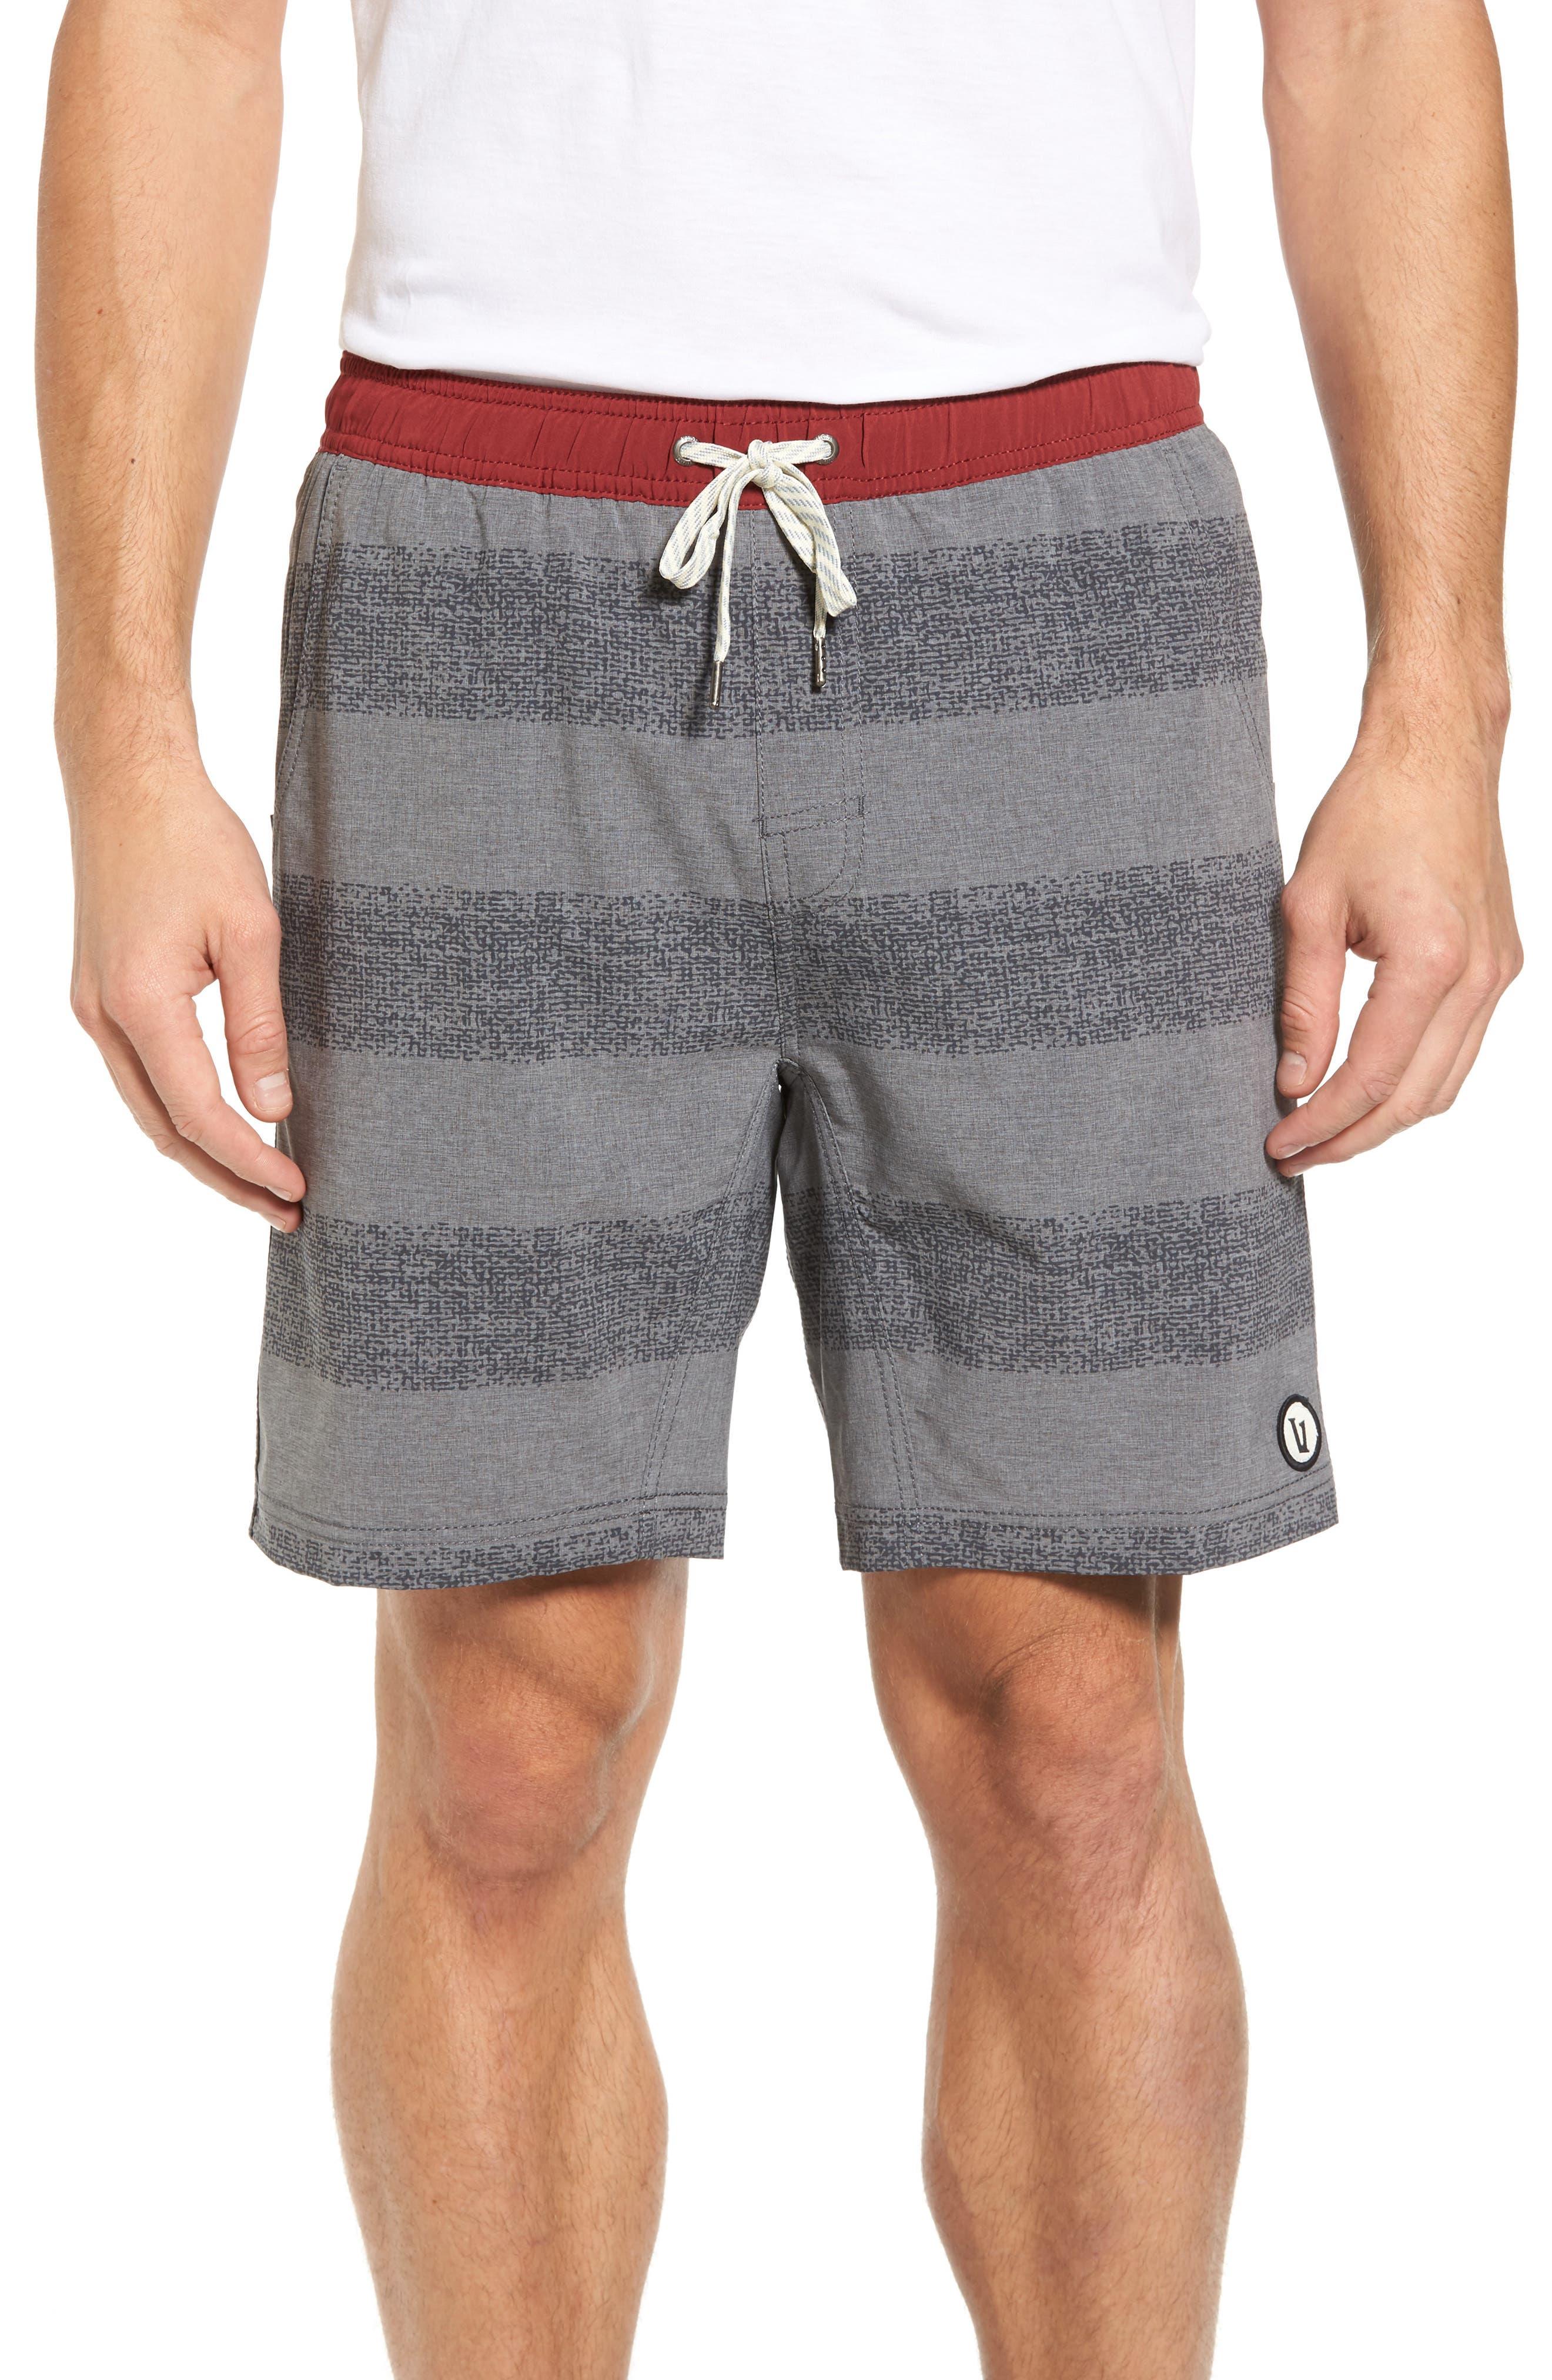 VUORI Kore Slim Fit Athletic Shorts, Main, color, 035